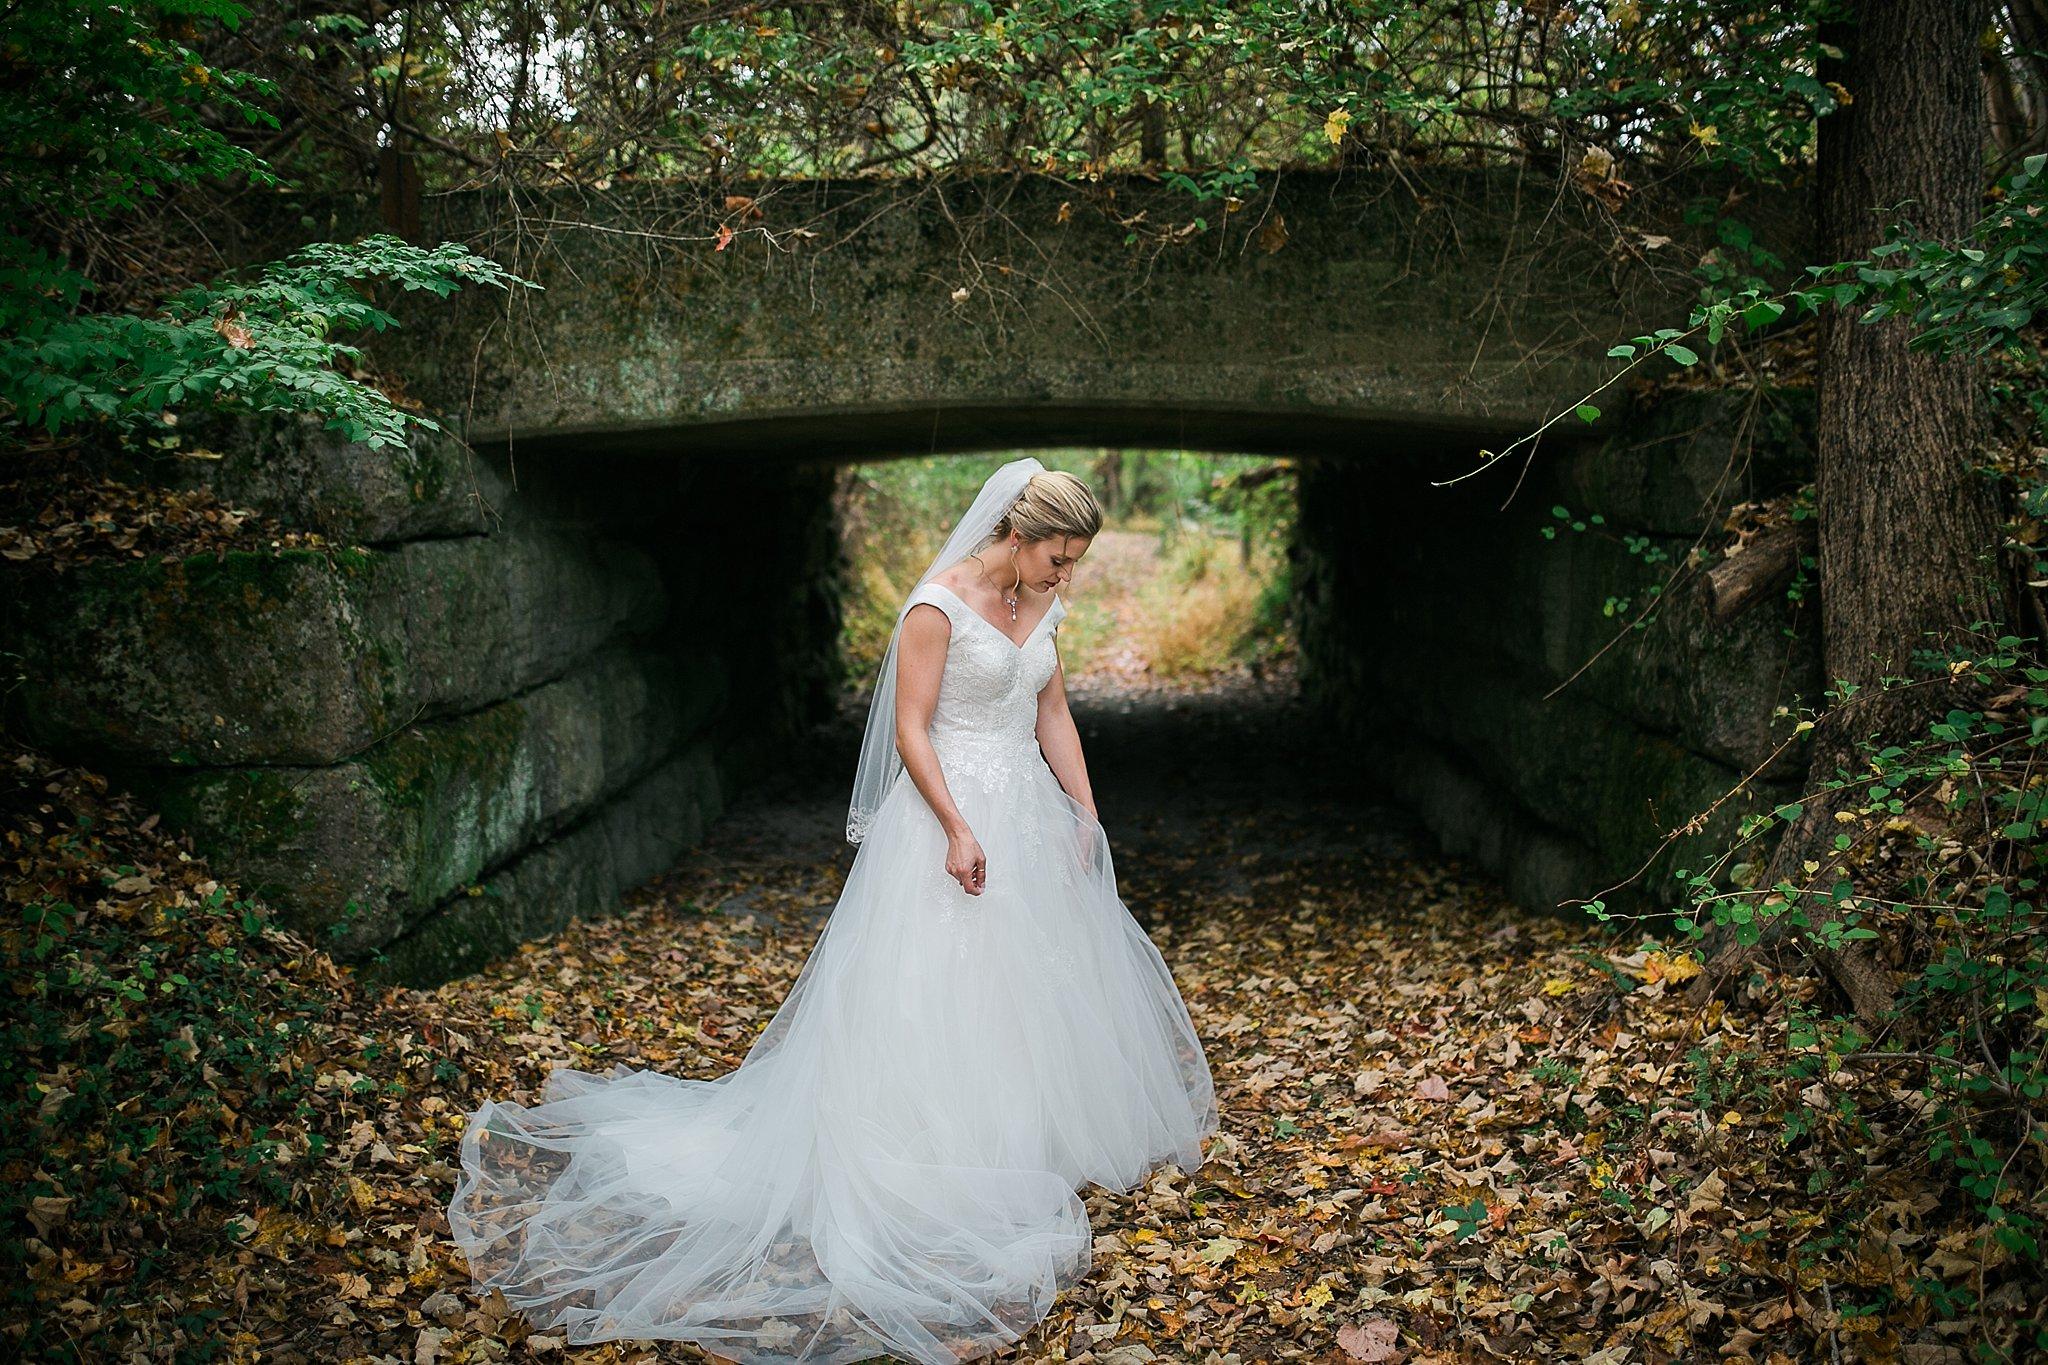 New Windsor New York Hudson Valley New York Wedding Photographer 29.jpg